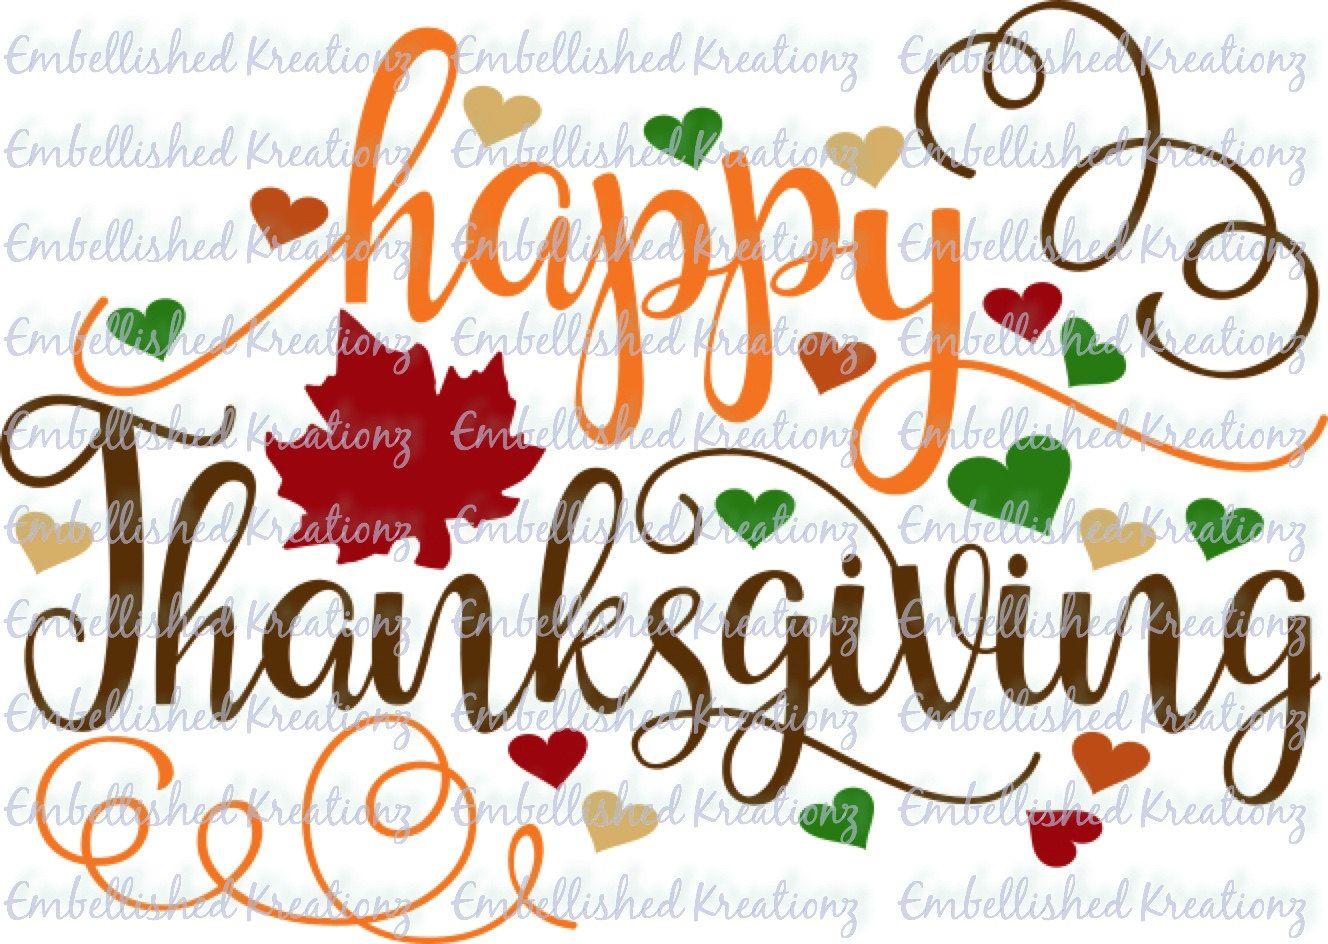 ThanksgivingHappy Thanksgiving With SwirlsHeartsLeaves Vinyl - Halloween vinyl decals for glass blocks